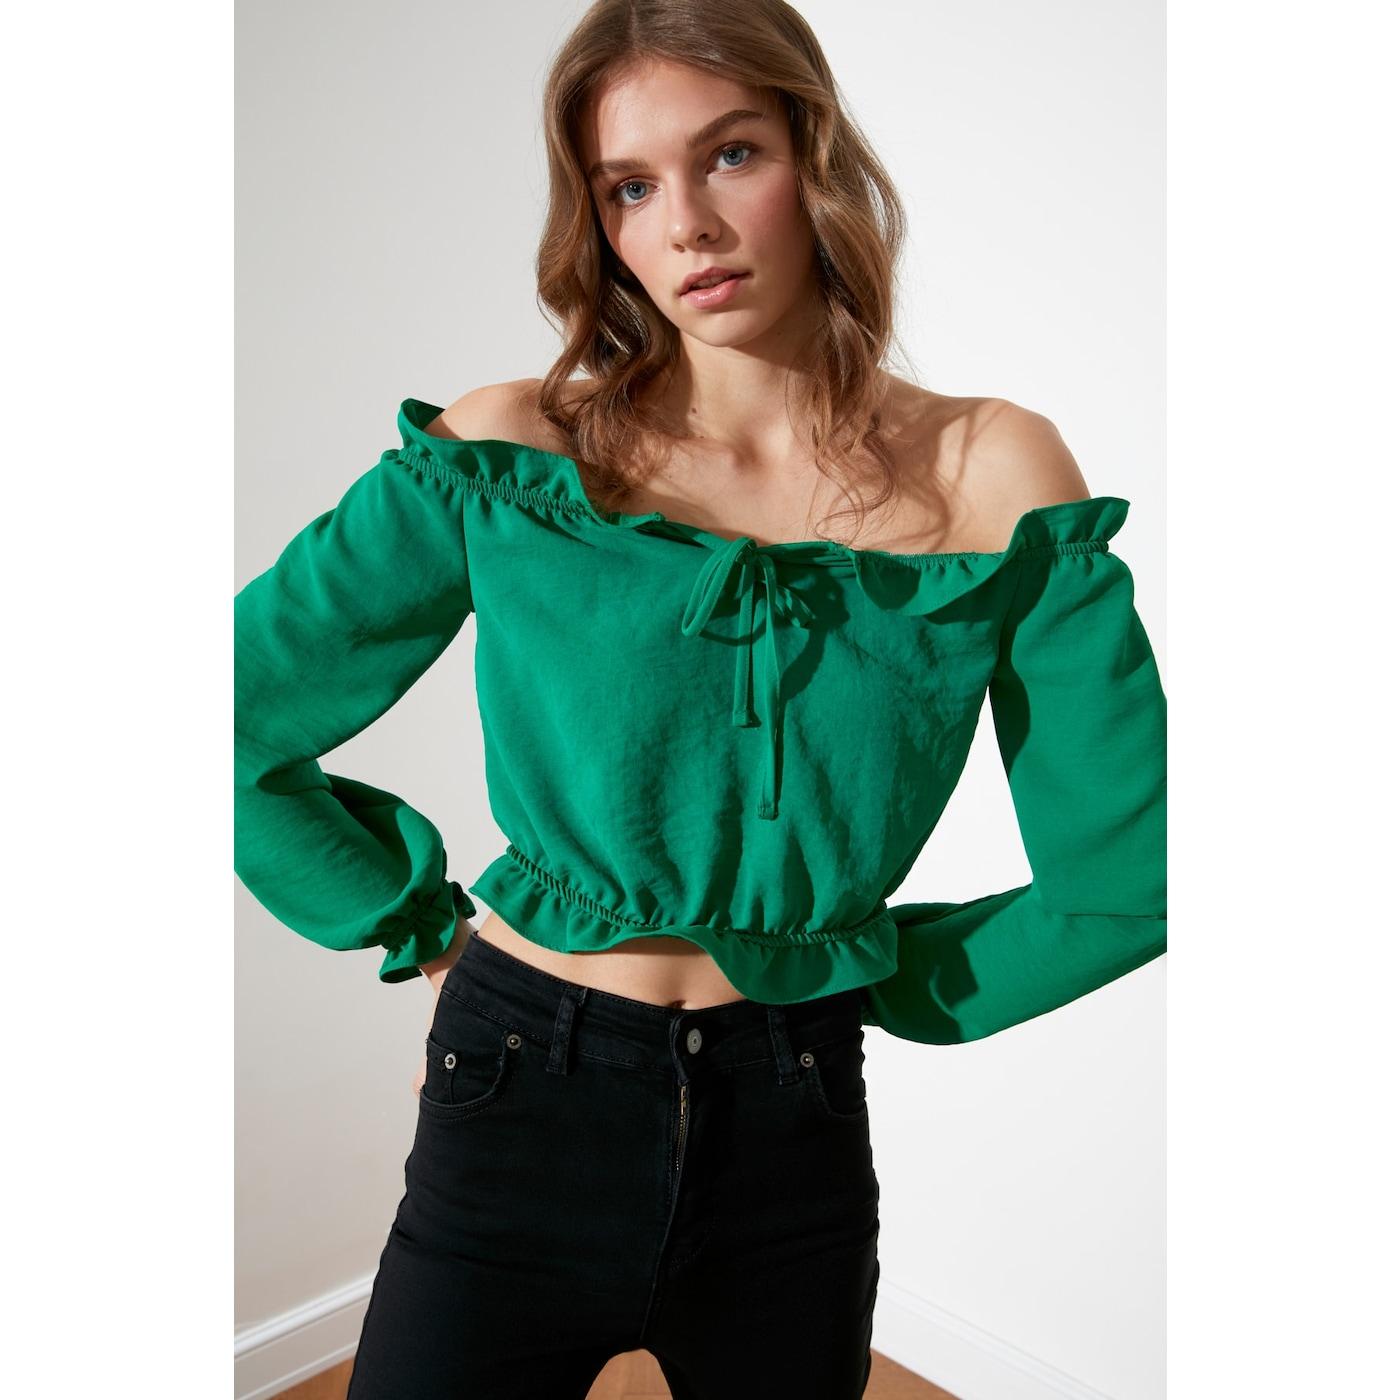 Trendyol Green Binding Detailed Blouse dámské 36